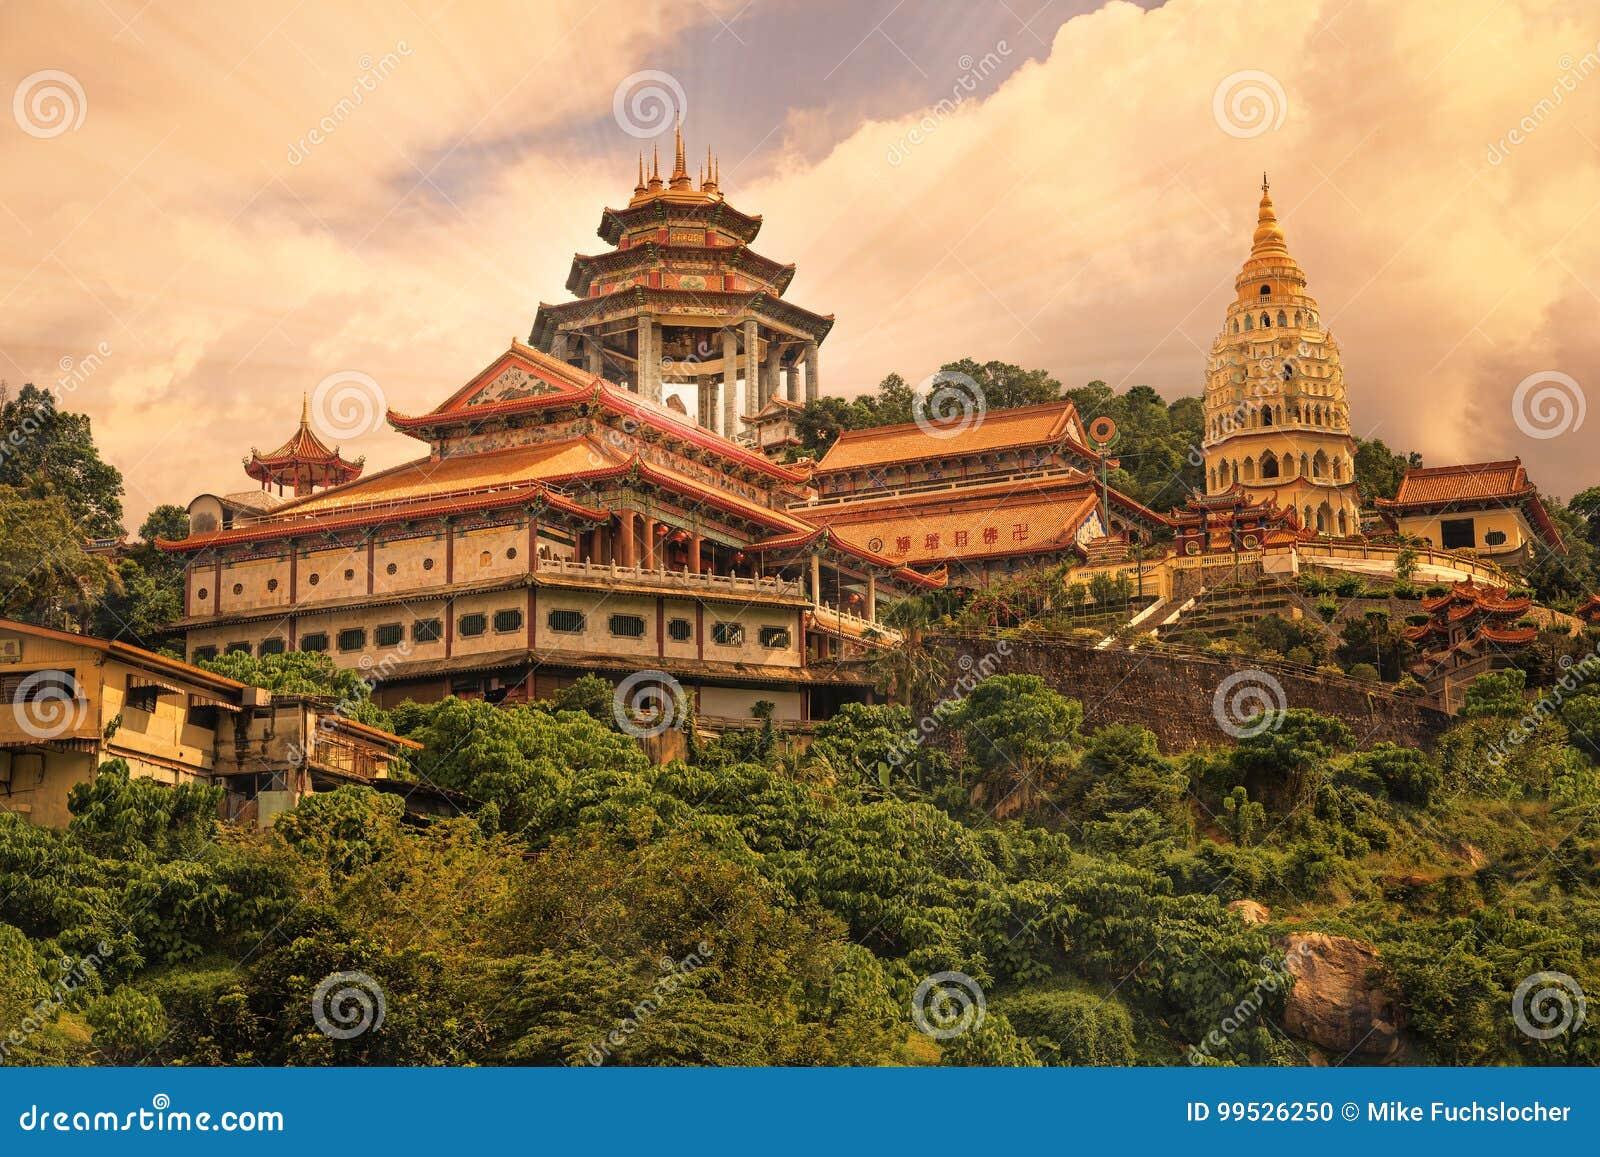 Buddyjska świątynia Kek Lok Si w Penang